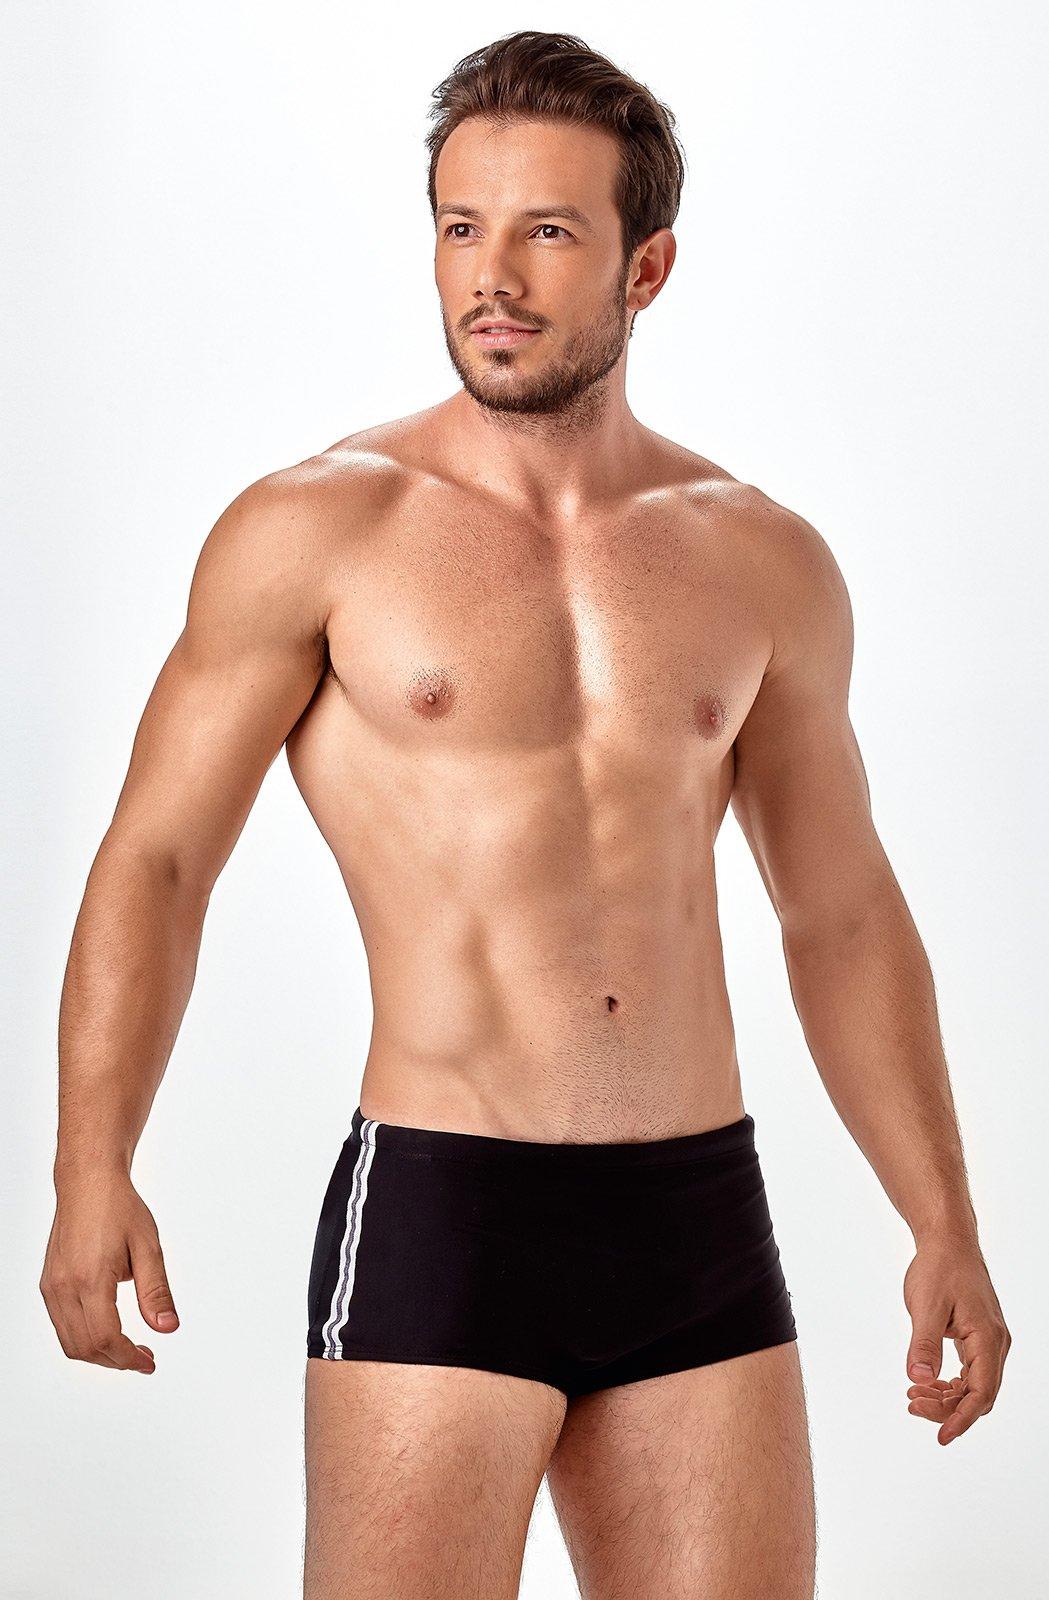 Male bikini pix